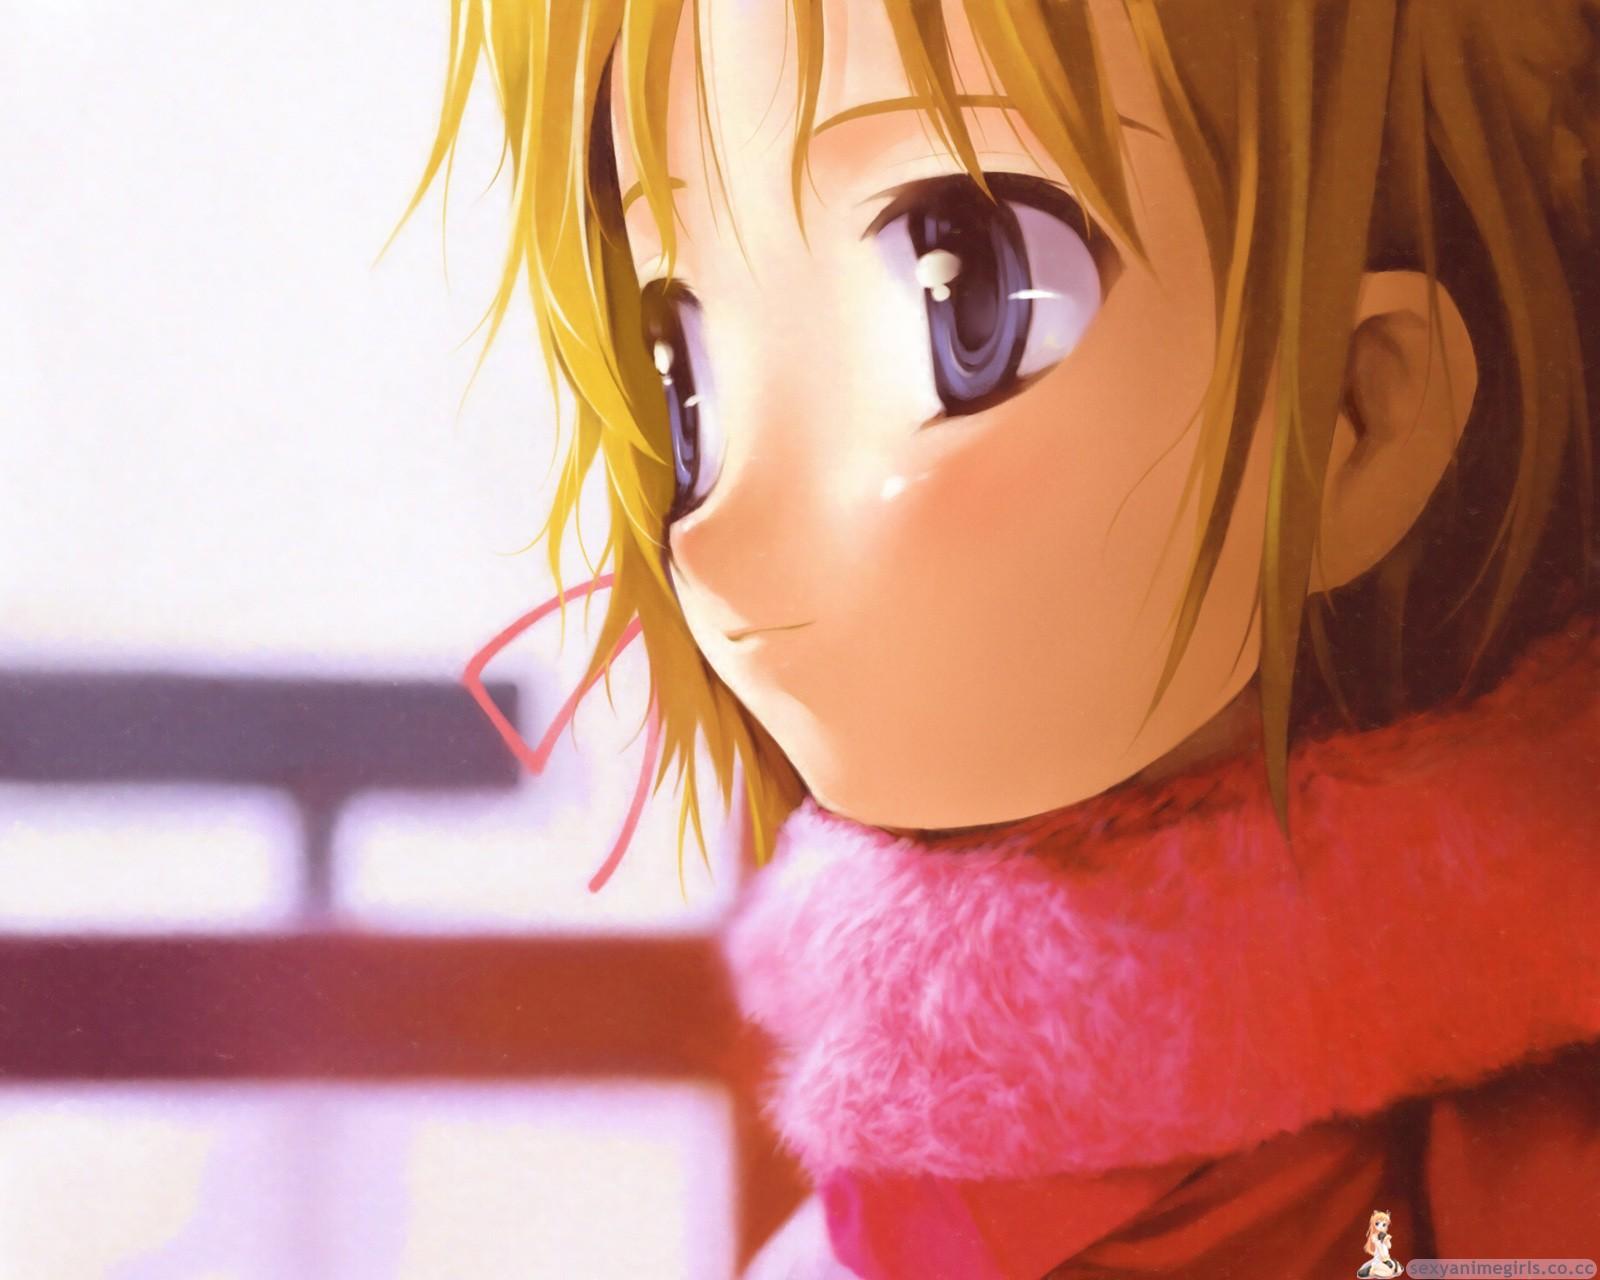 http://4.bp.blogspot.com/-H0OwFKUzgWw/UAxWNkKGbzI/AAAAAAAADAU/0AT7_AWPLRI/s1600/Cute+Anime+Girl.jpg